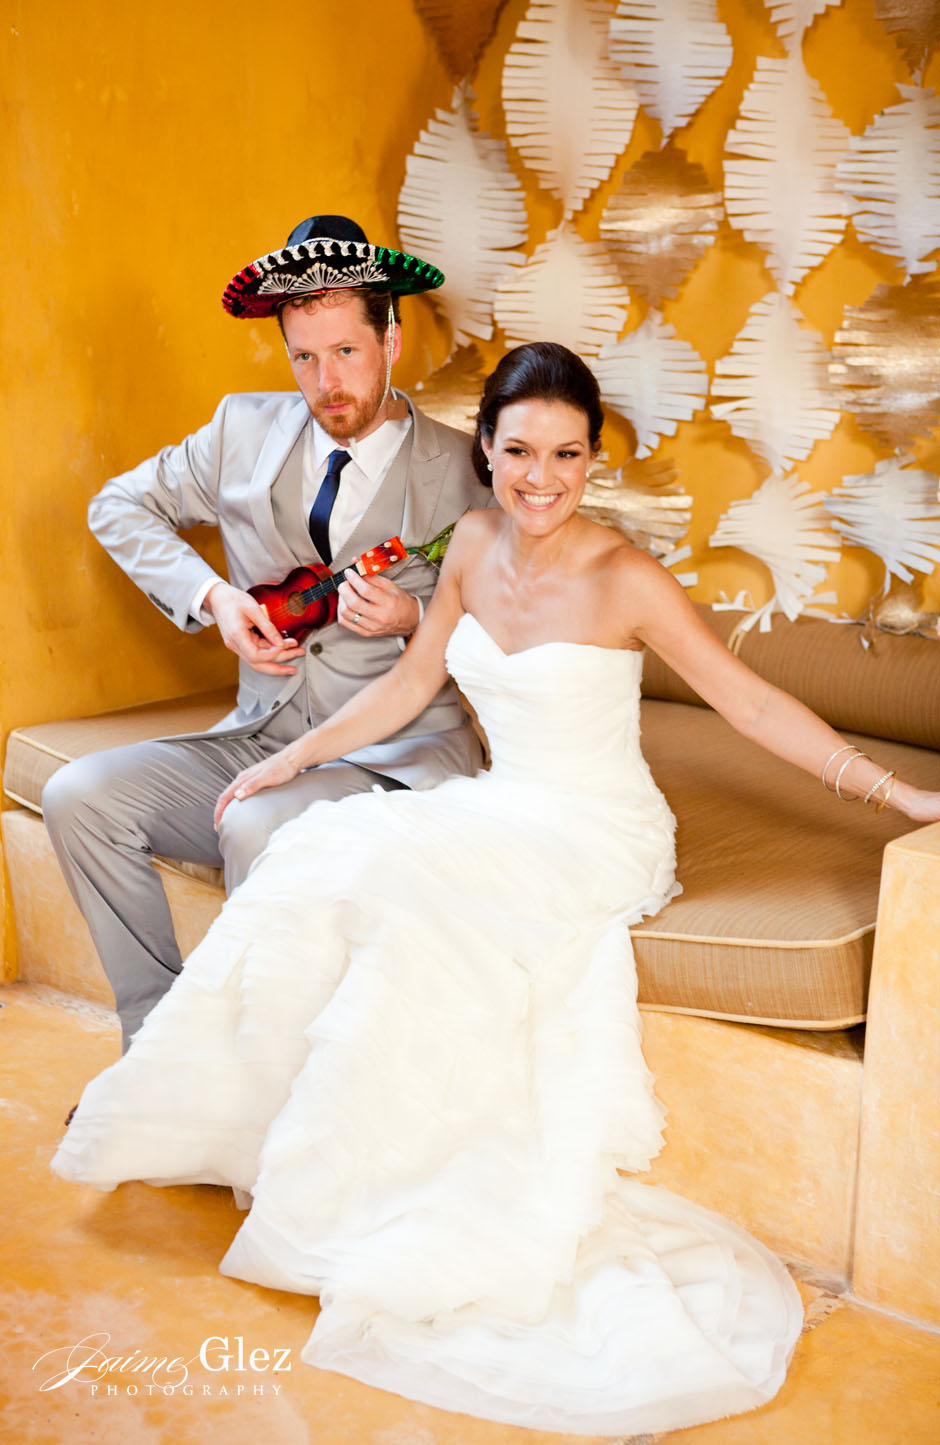 hacienda sac chich wedding photography 6.jpg